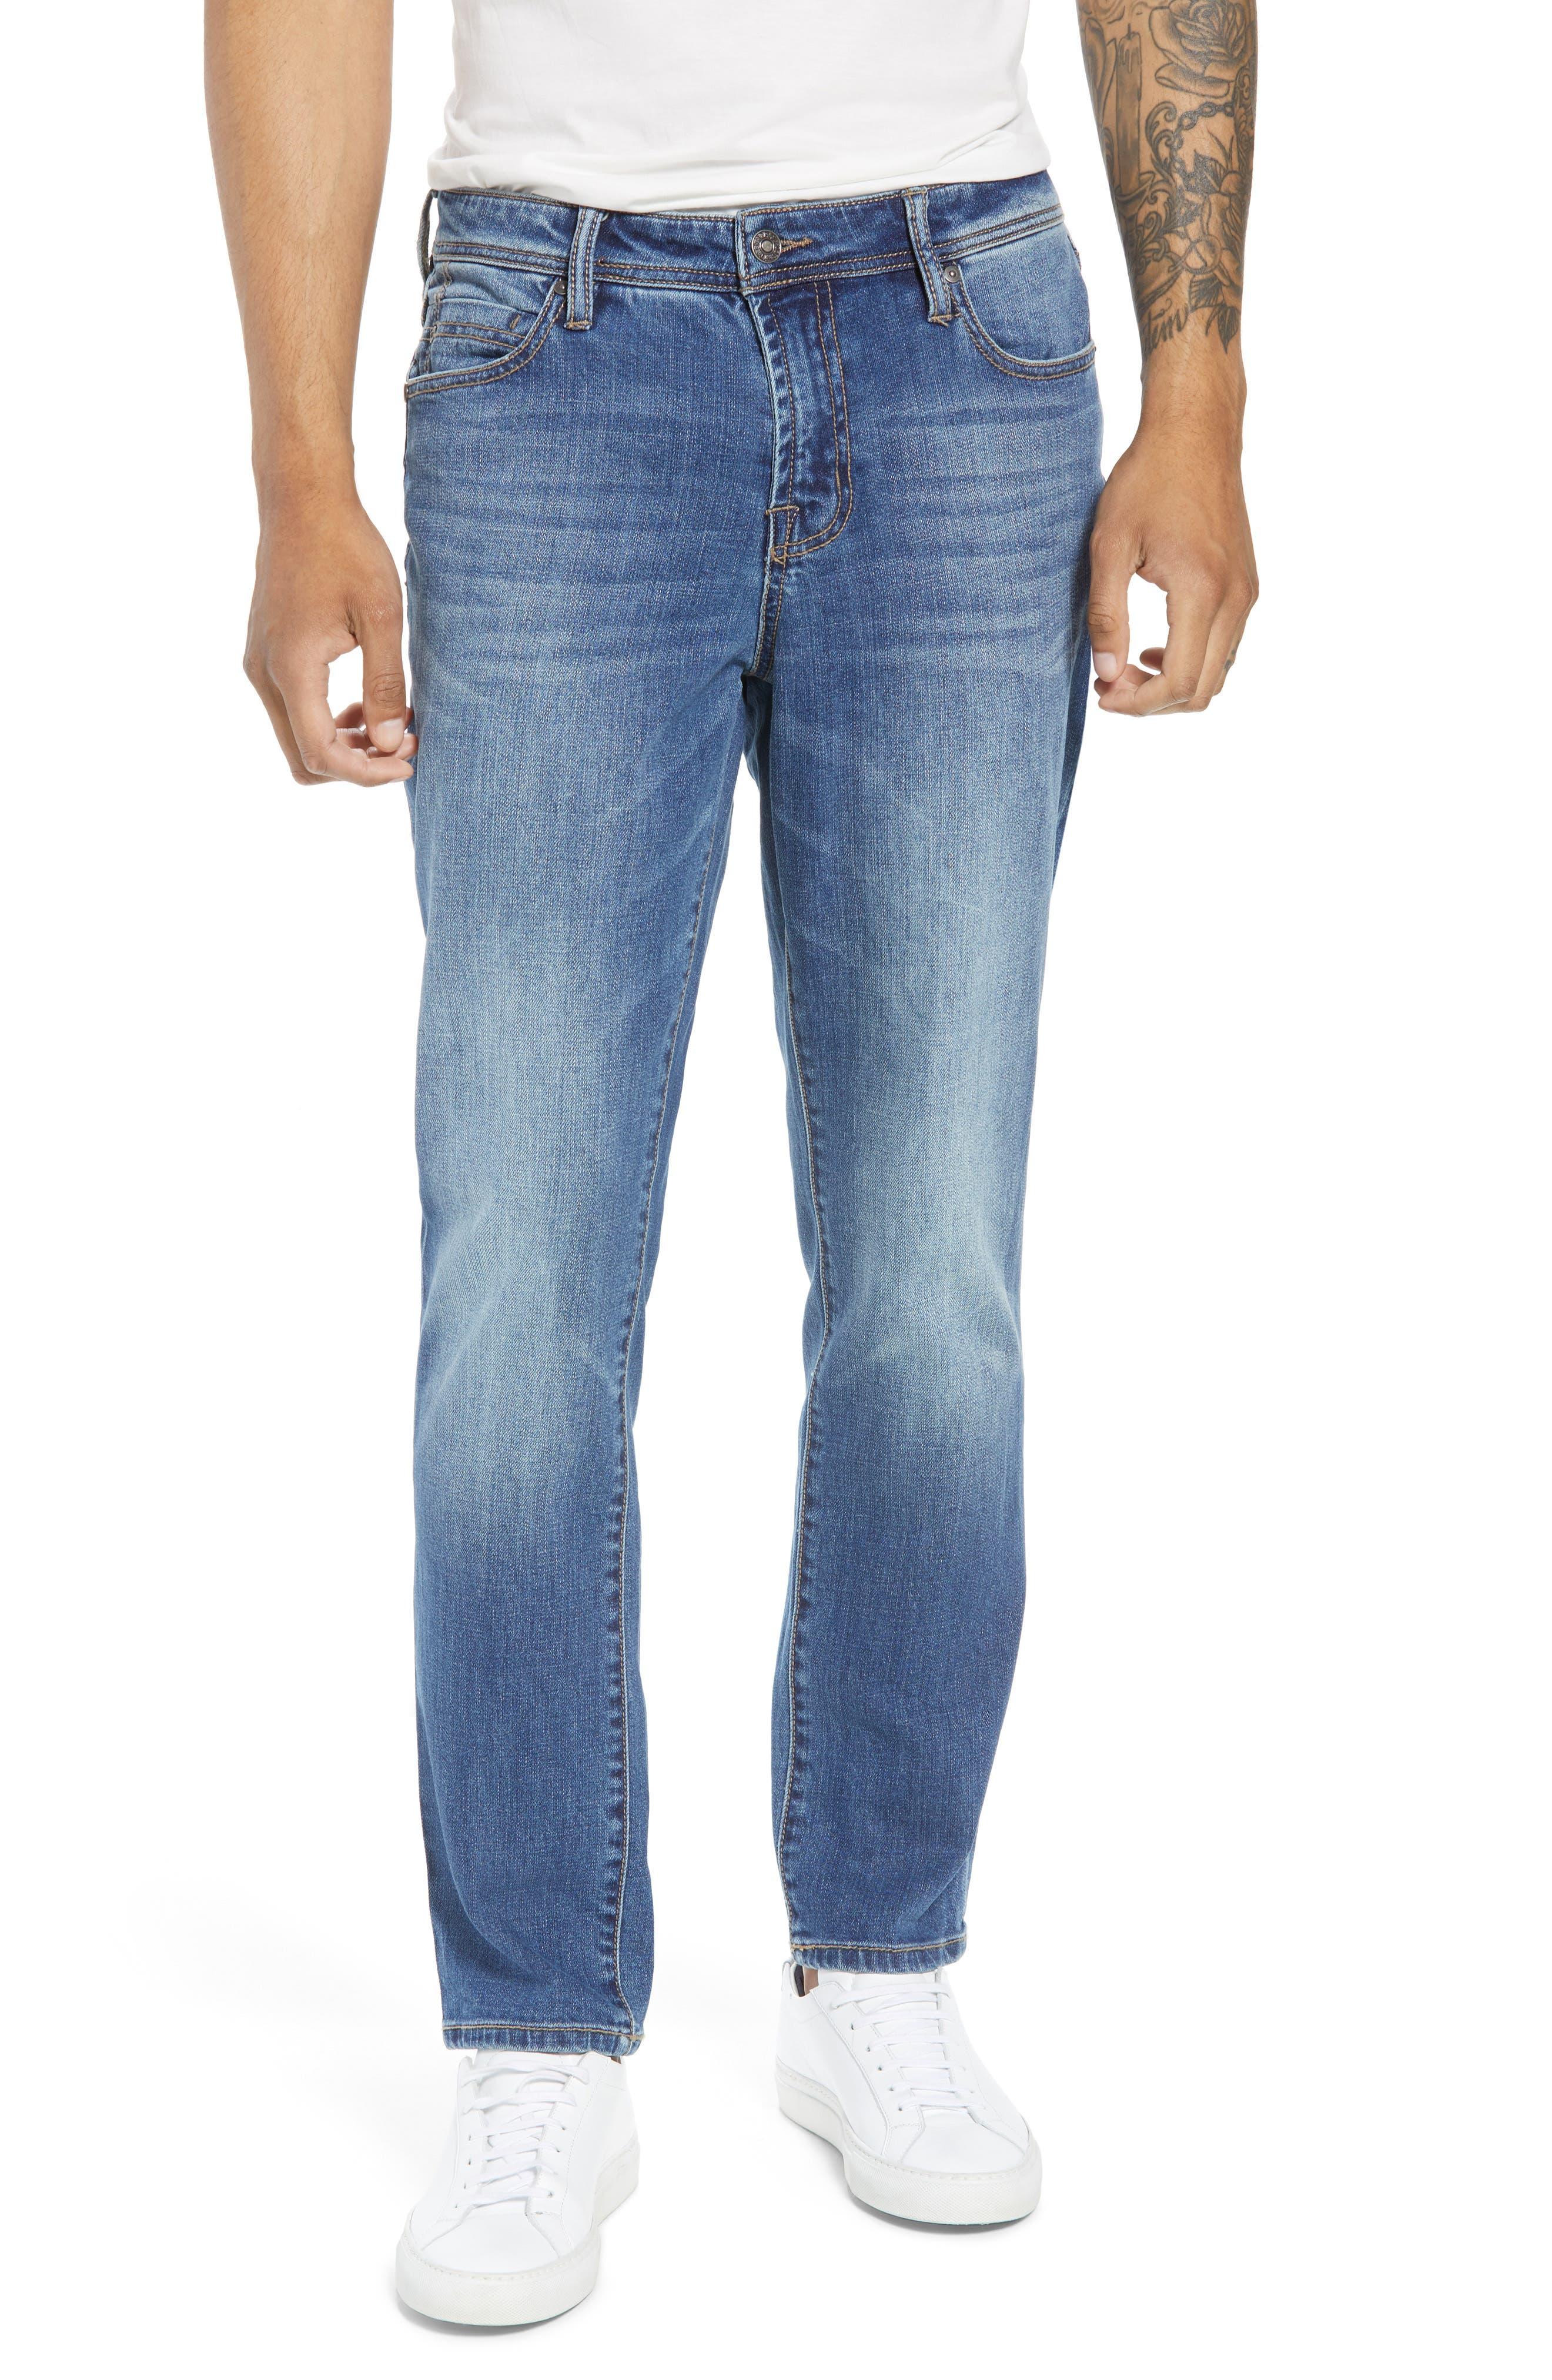 Jeans Co. Slim Straight Leg Jeans,                             Main thumbnail 1, color,                             BRYSON VINTAGE MED